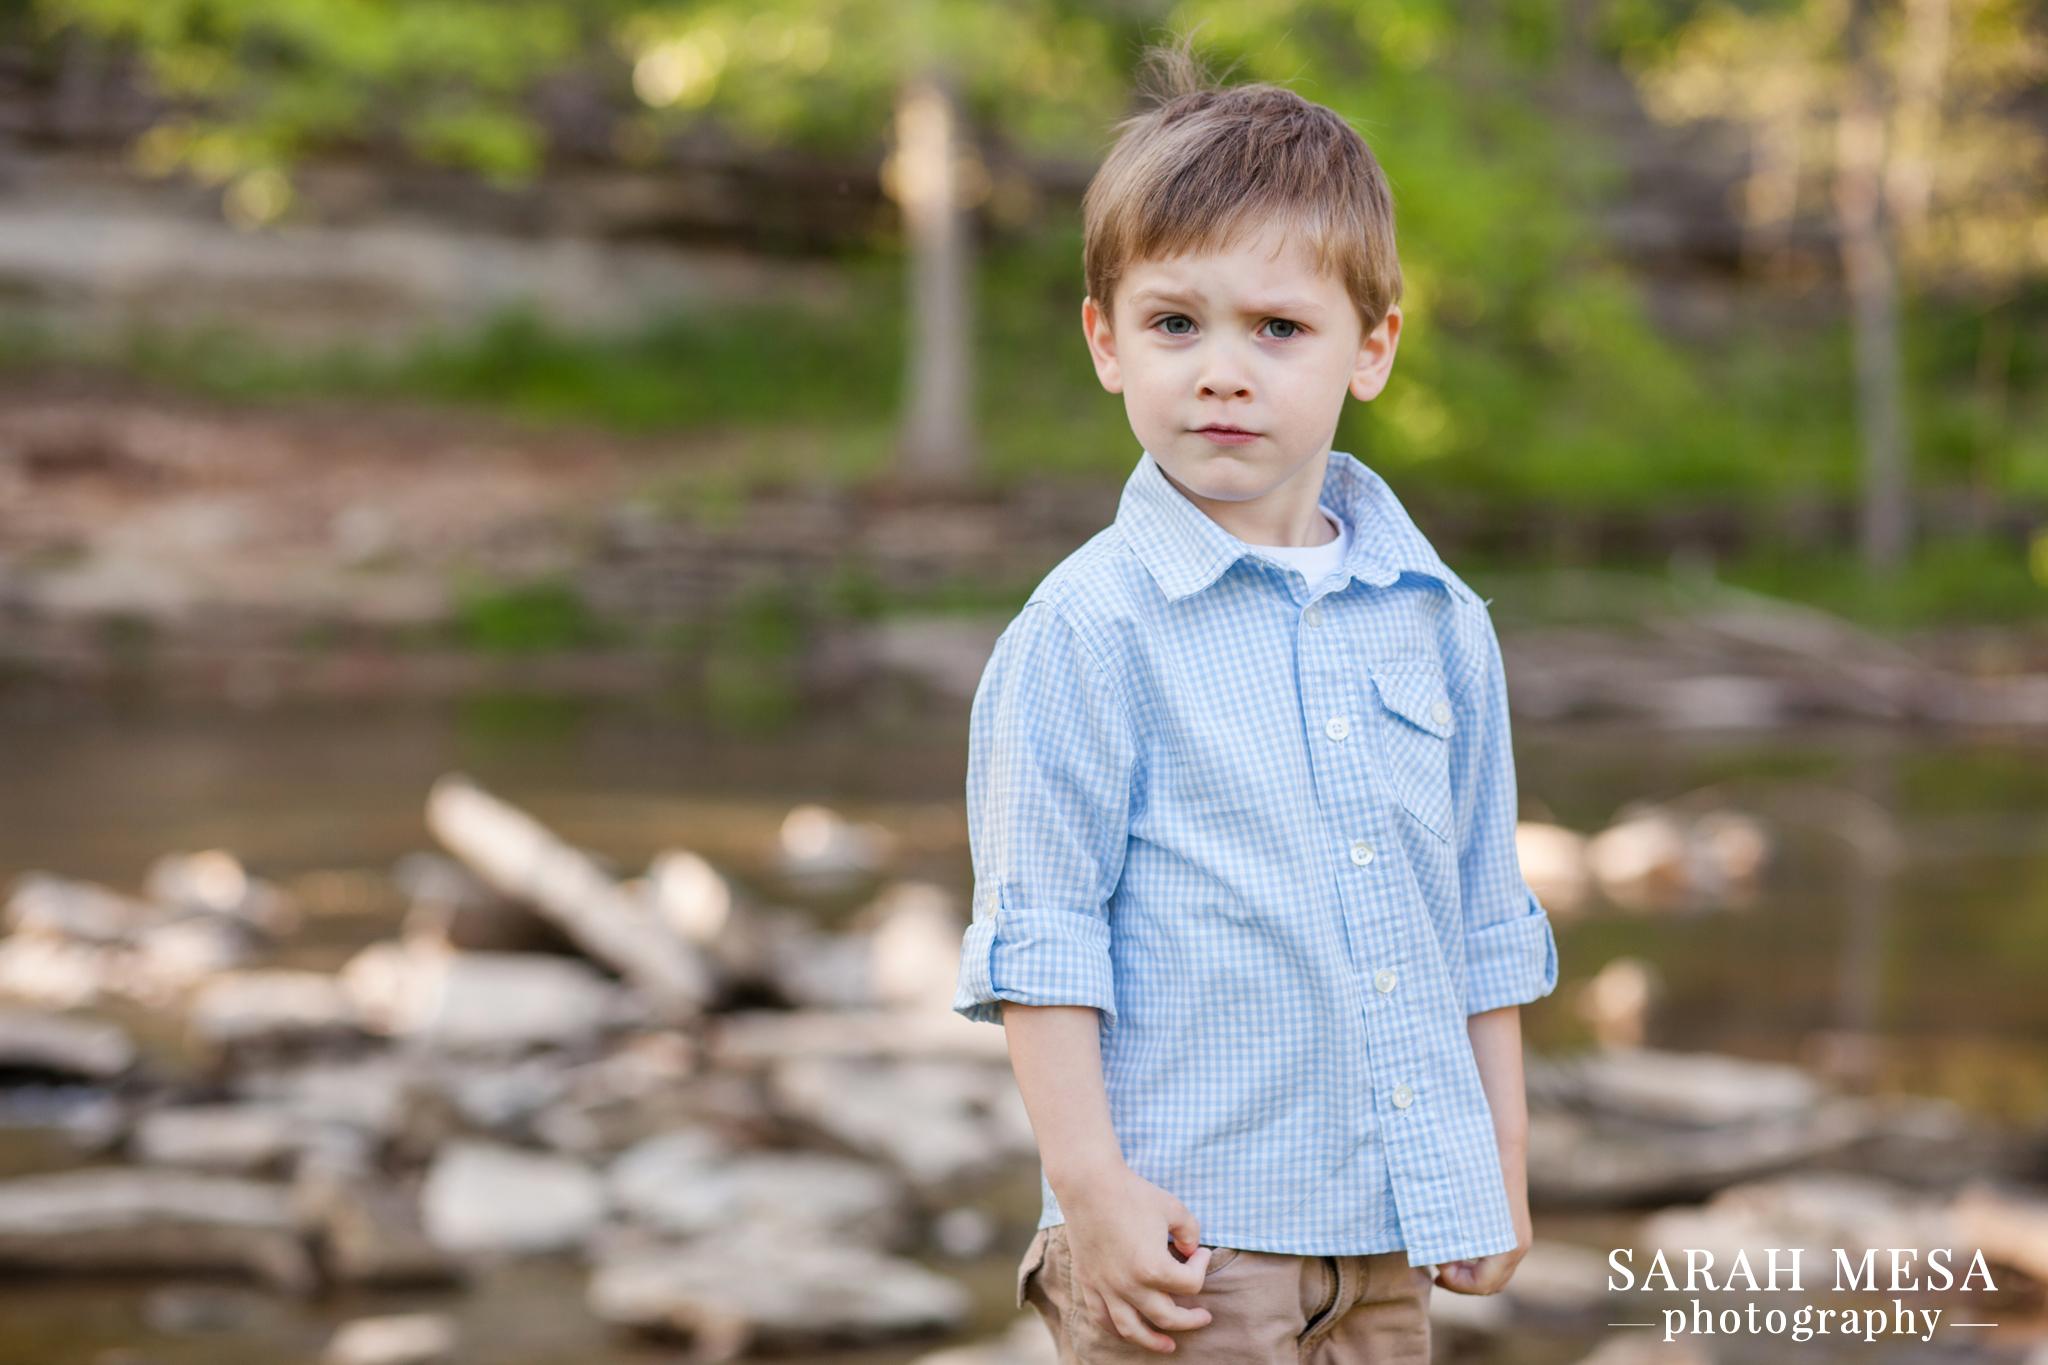 Sarah Mesa Photography | Louisville Wedding and Portrait Photographer